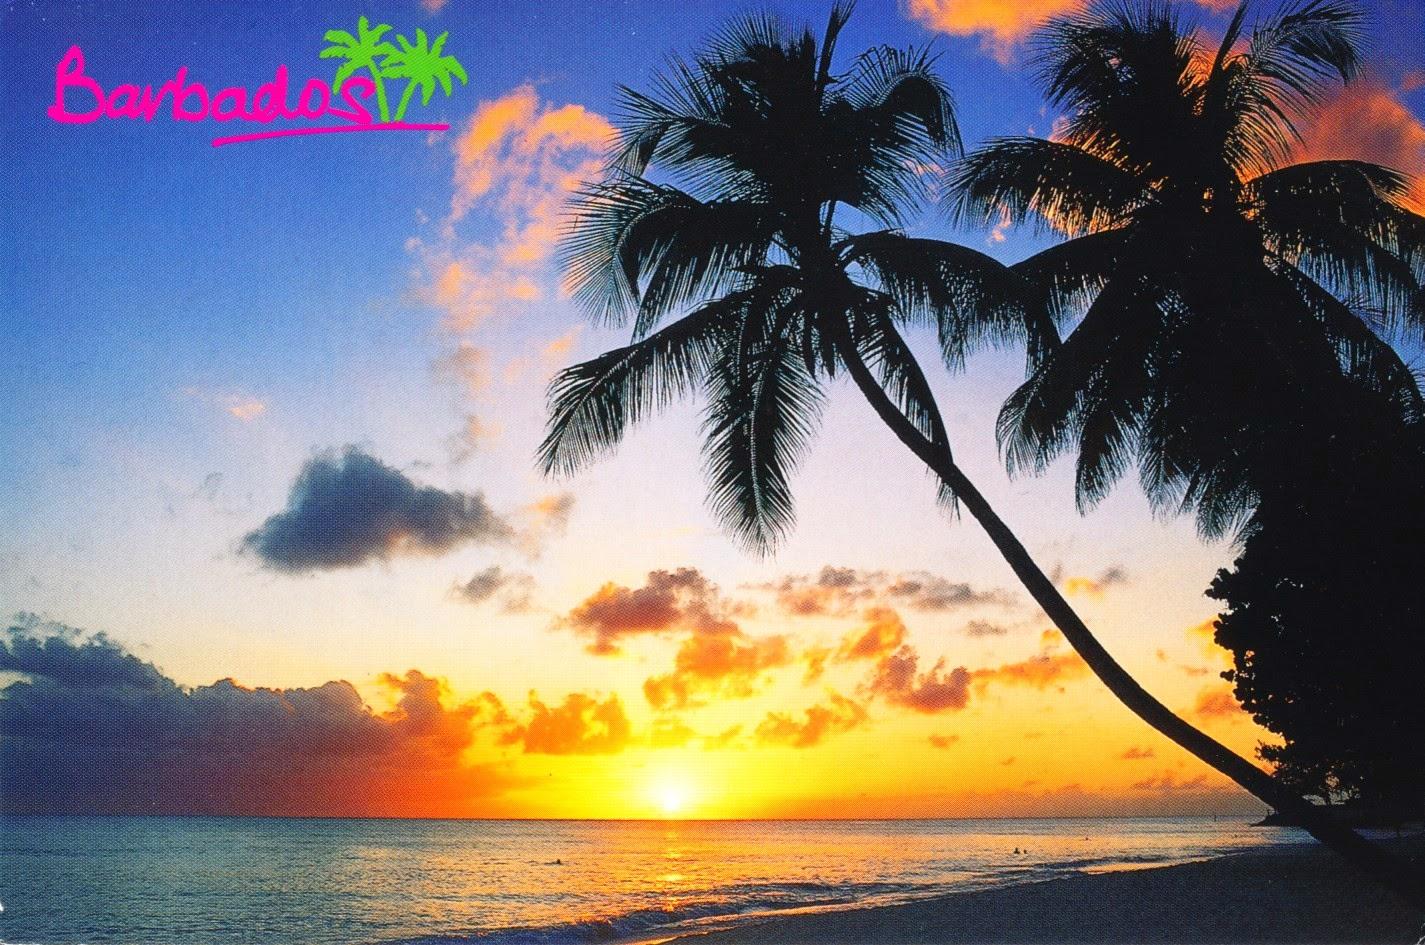 barbados, beach, atlantic ocean, caribbean